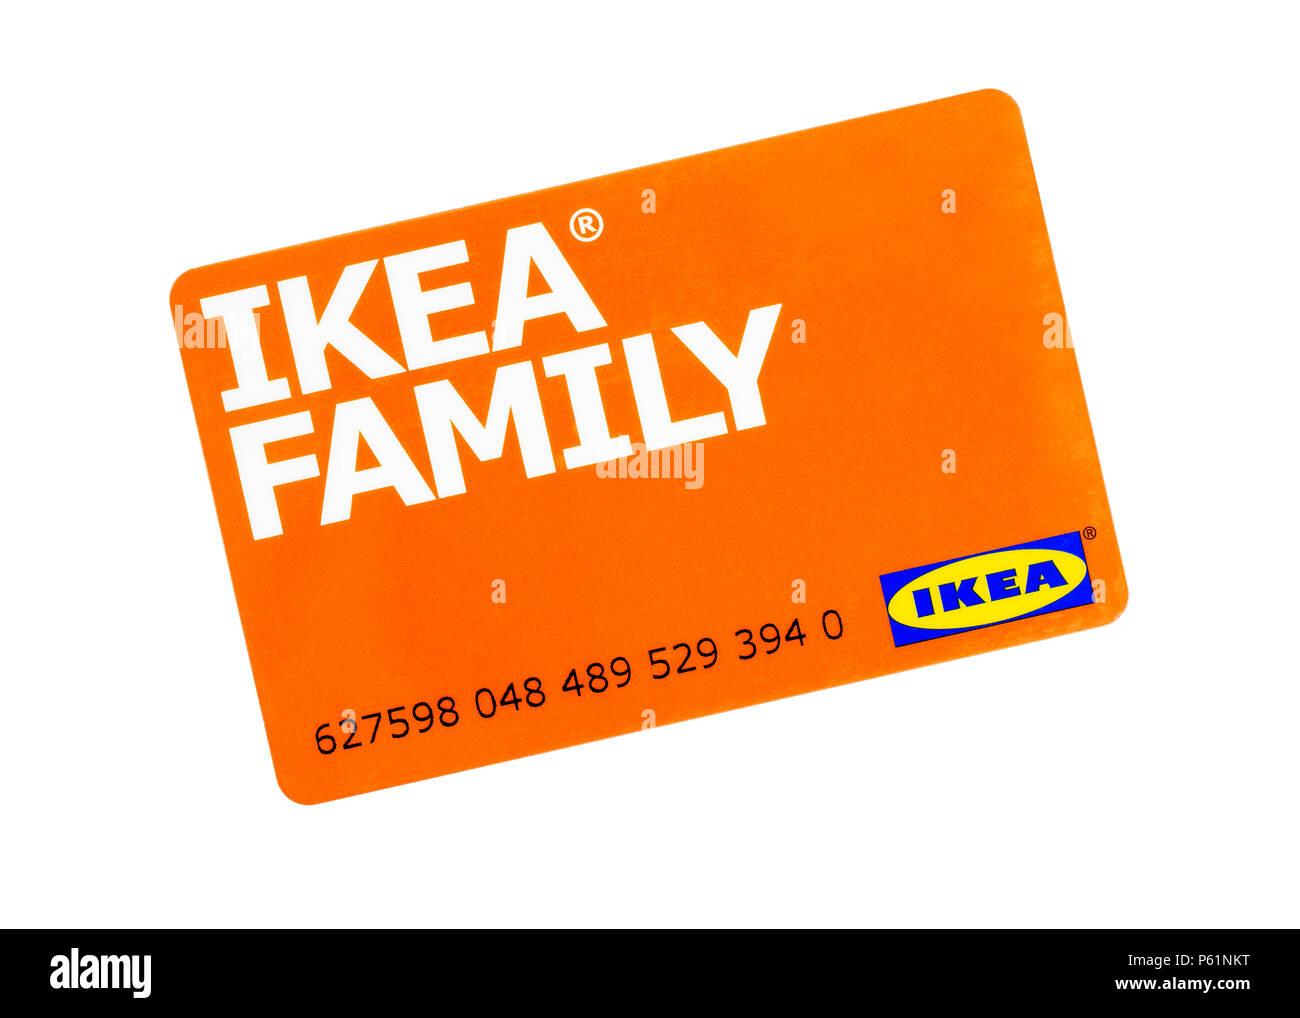 Ikea Family Loyalty Card Stockfoto Bild 210251324 Alamy